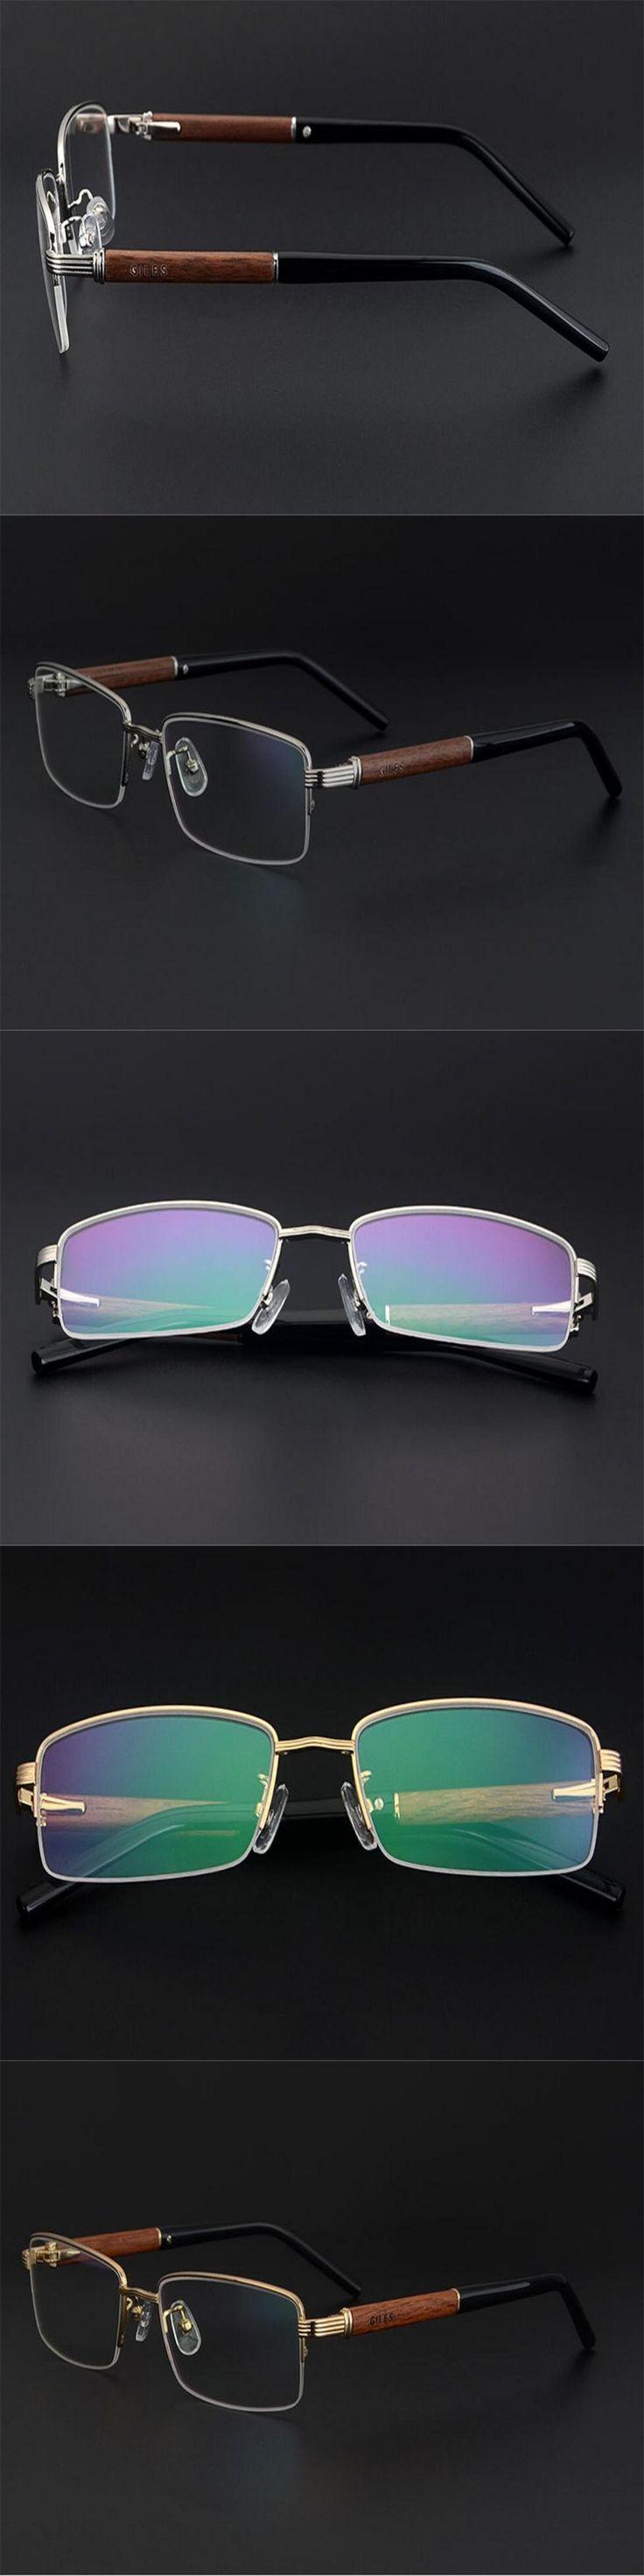 DOWER ME Brand Men Half Rim Alloy Business Wooden Temple Gold Silver Myopia Reading Eyeglasses Presbyopia Eyewear JLSA7